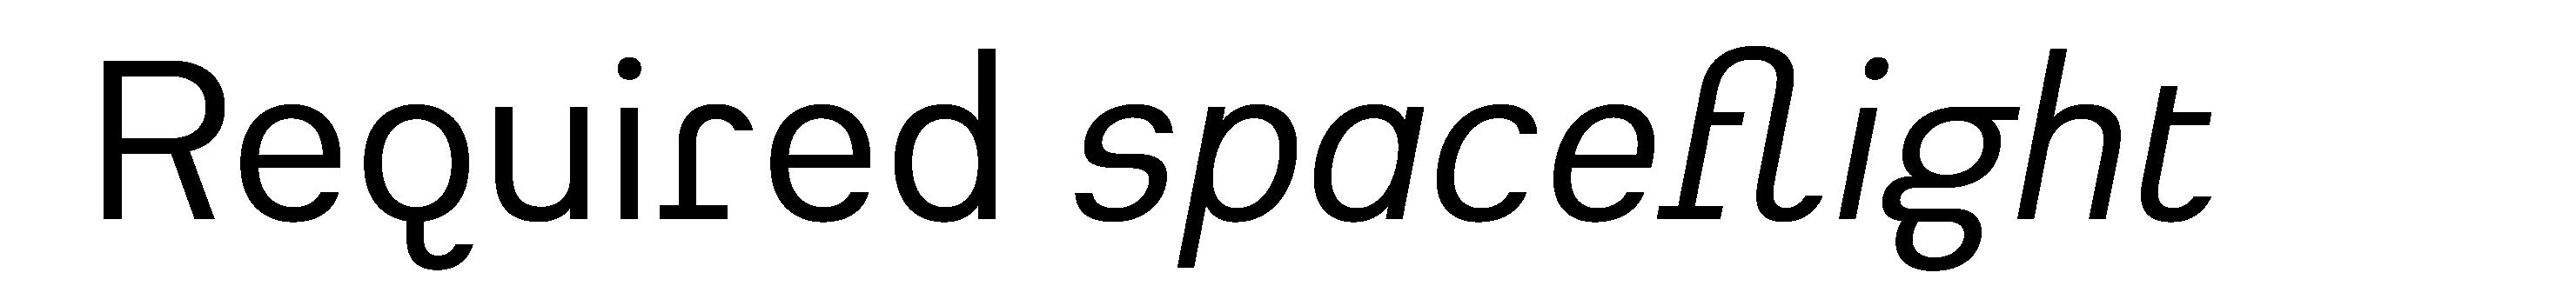 Typeface Heimat Sans D03 Atlas Font Foundry